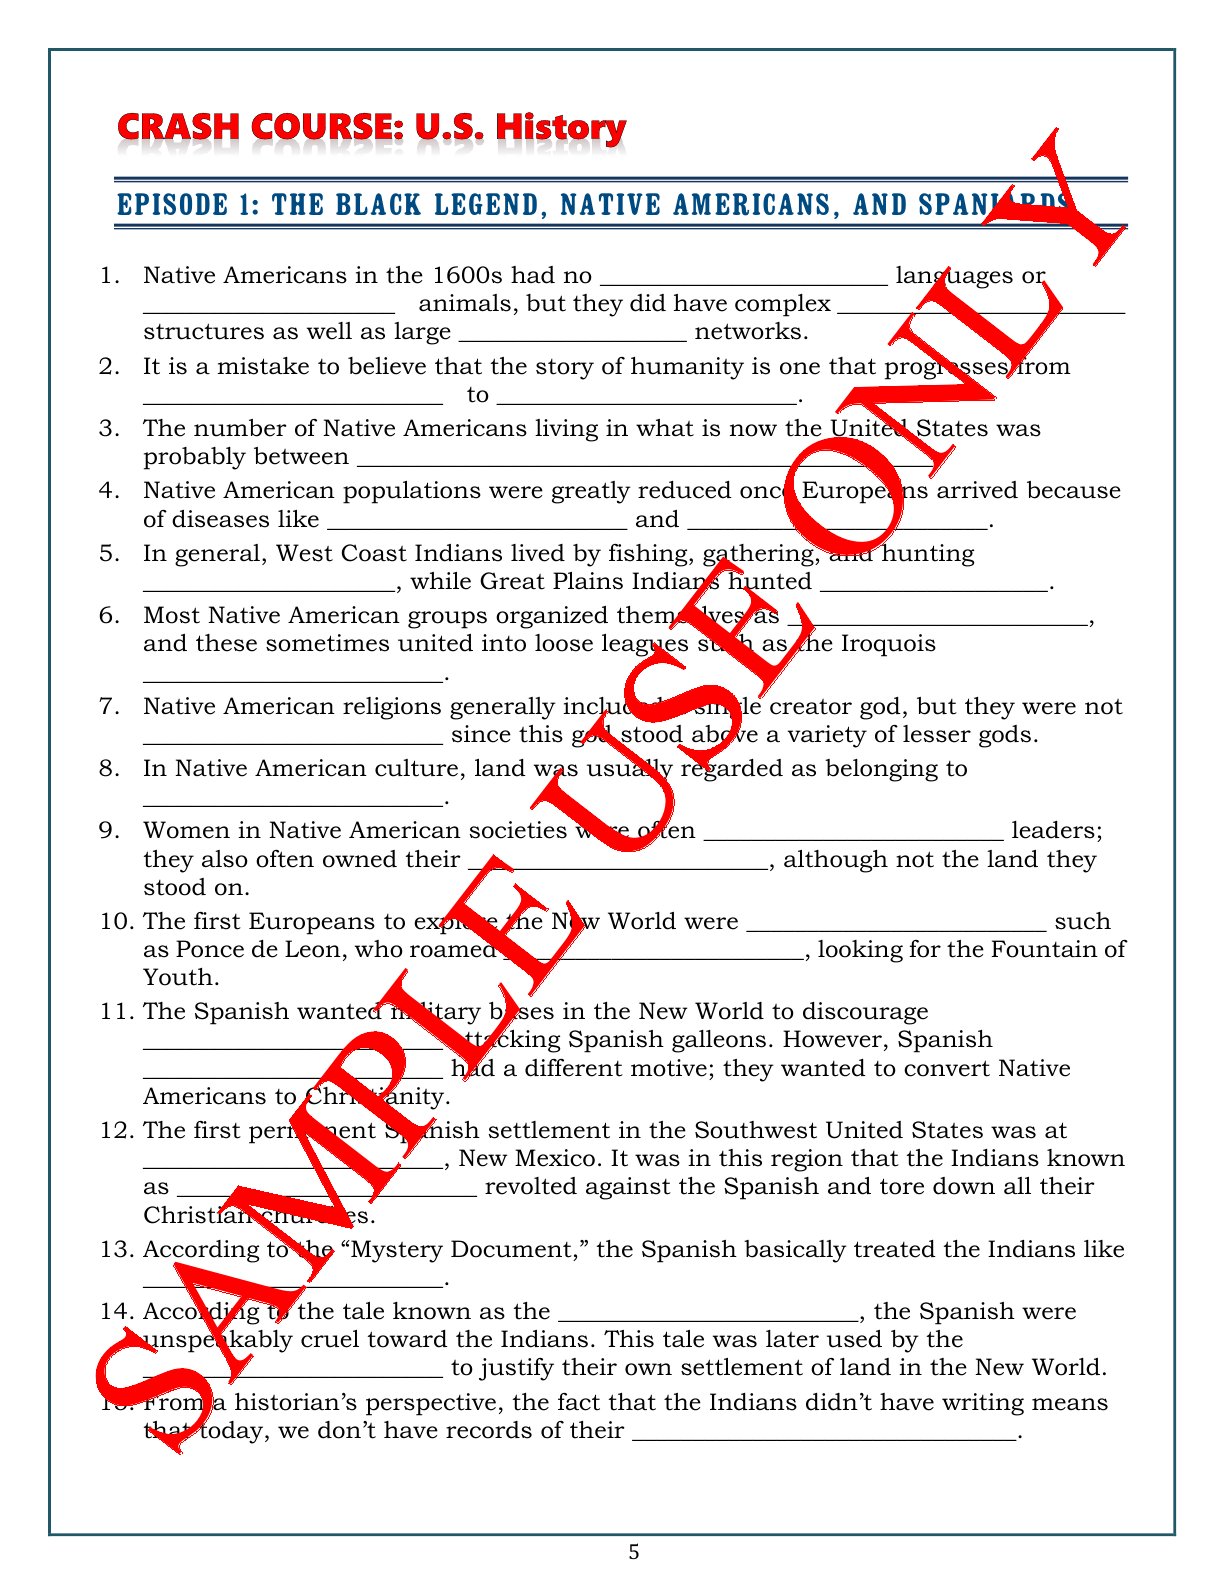 medium resolution of Crash Course U.S. History Worksheets make teaching \u0026 learning fun! A mix of  T/F